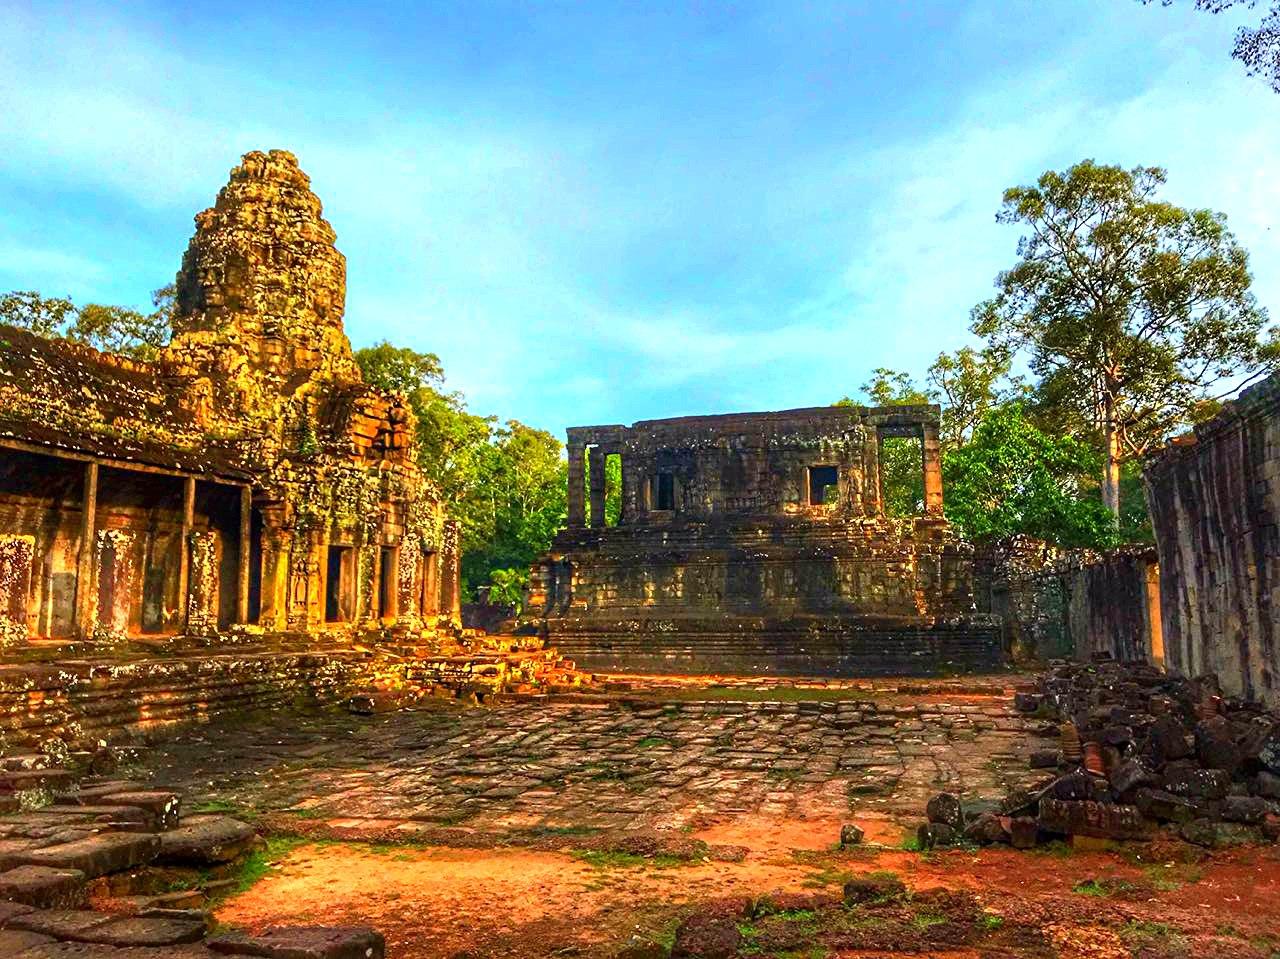 Елена Руденко (Валтея). Камбоджа. Ангкор. - Страница 2 MQCpGiyU_yc